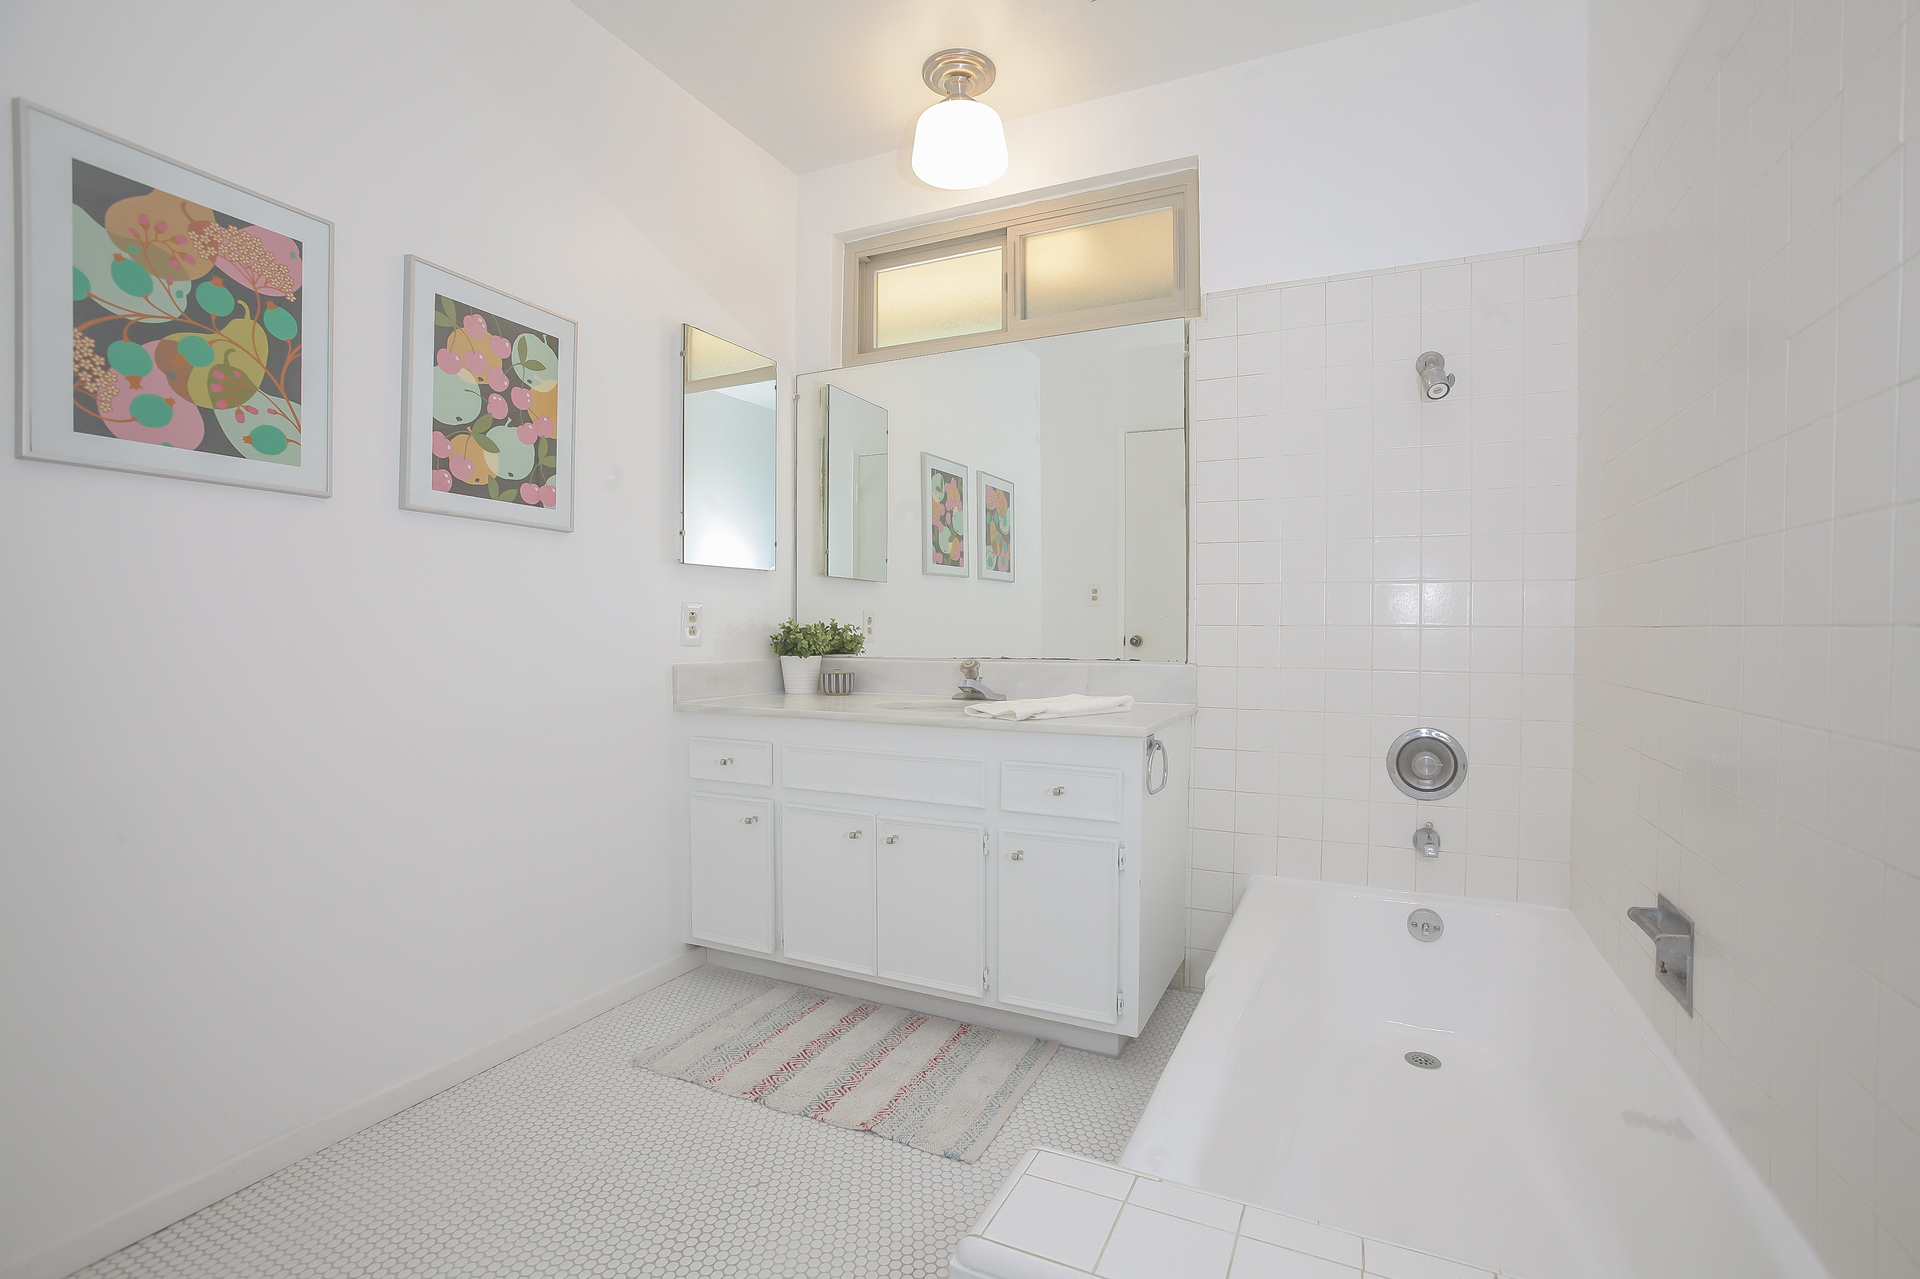 030-Middle_Bathroom-4443078-medium.jpg